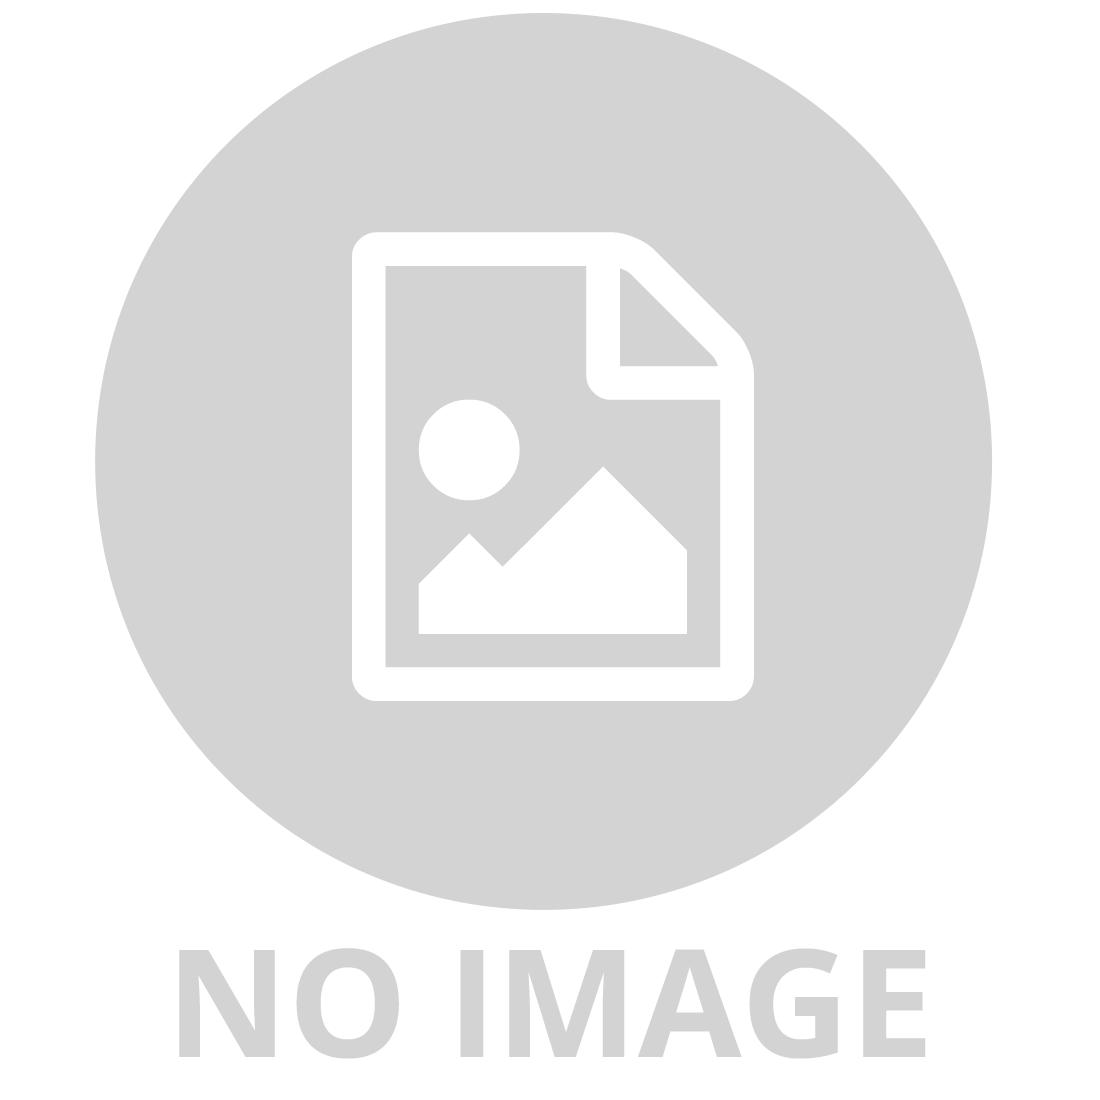 MAGCREATOR 31 PIECES